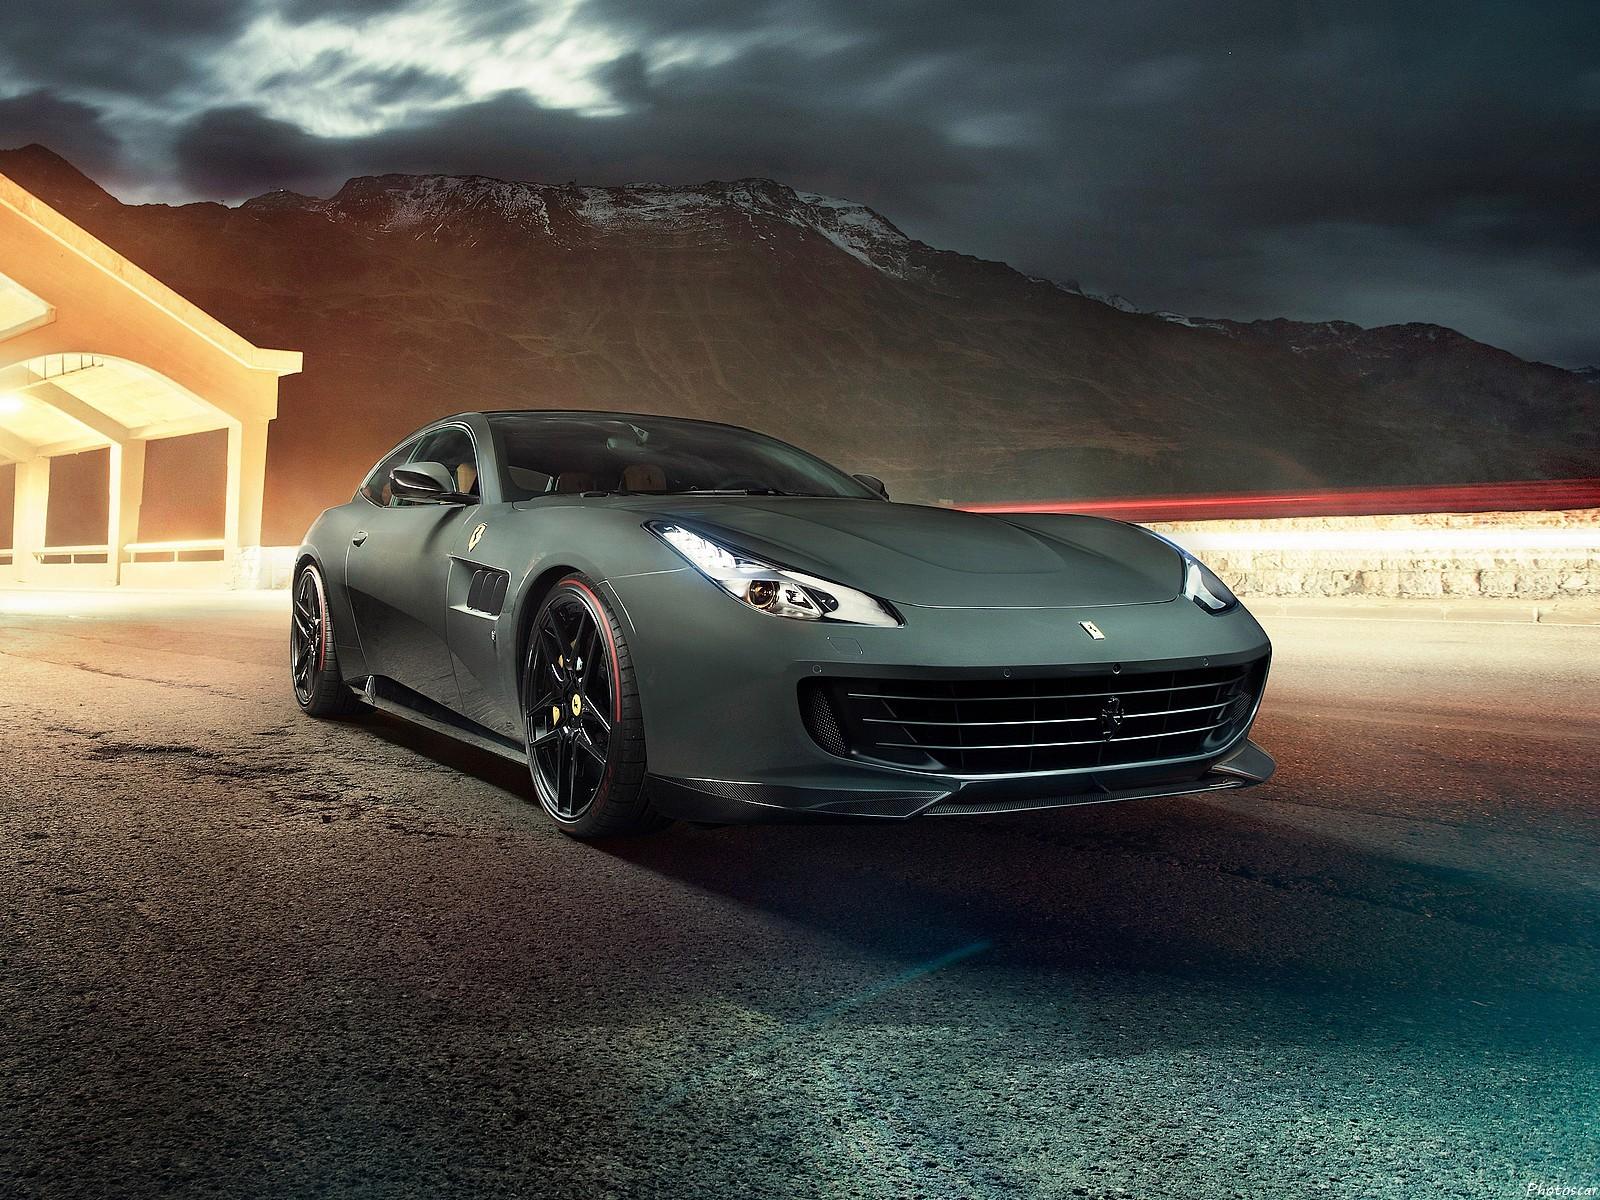 Ferrari GTC4 Lusso 2017 Novitec: kit de carrosserie en fibre de carbone